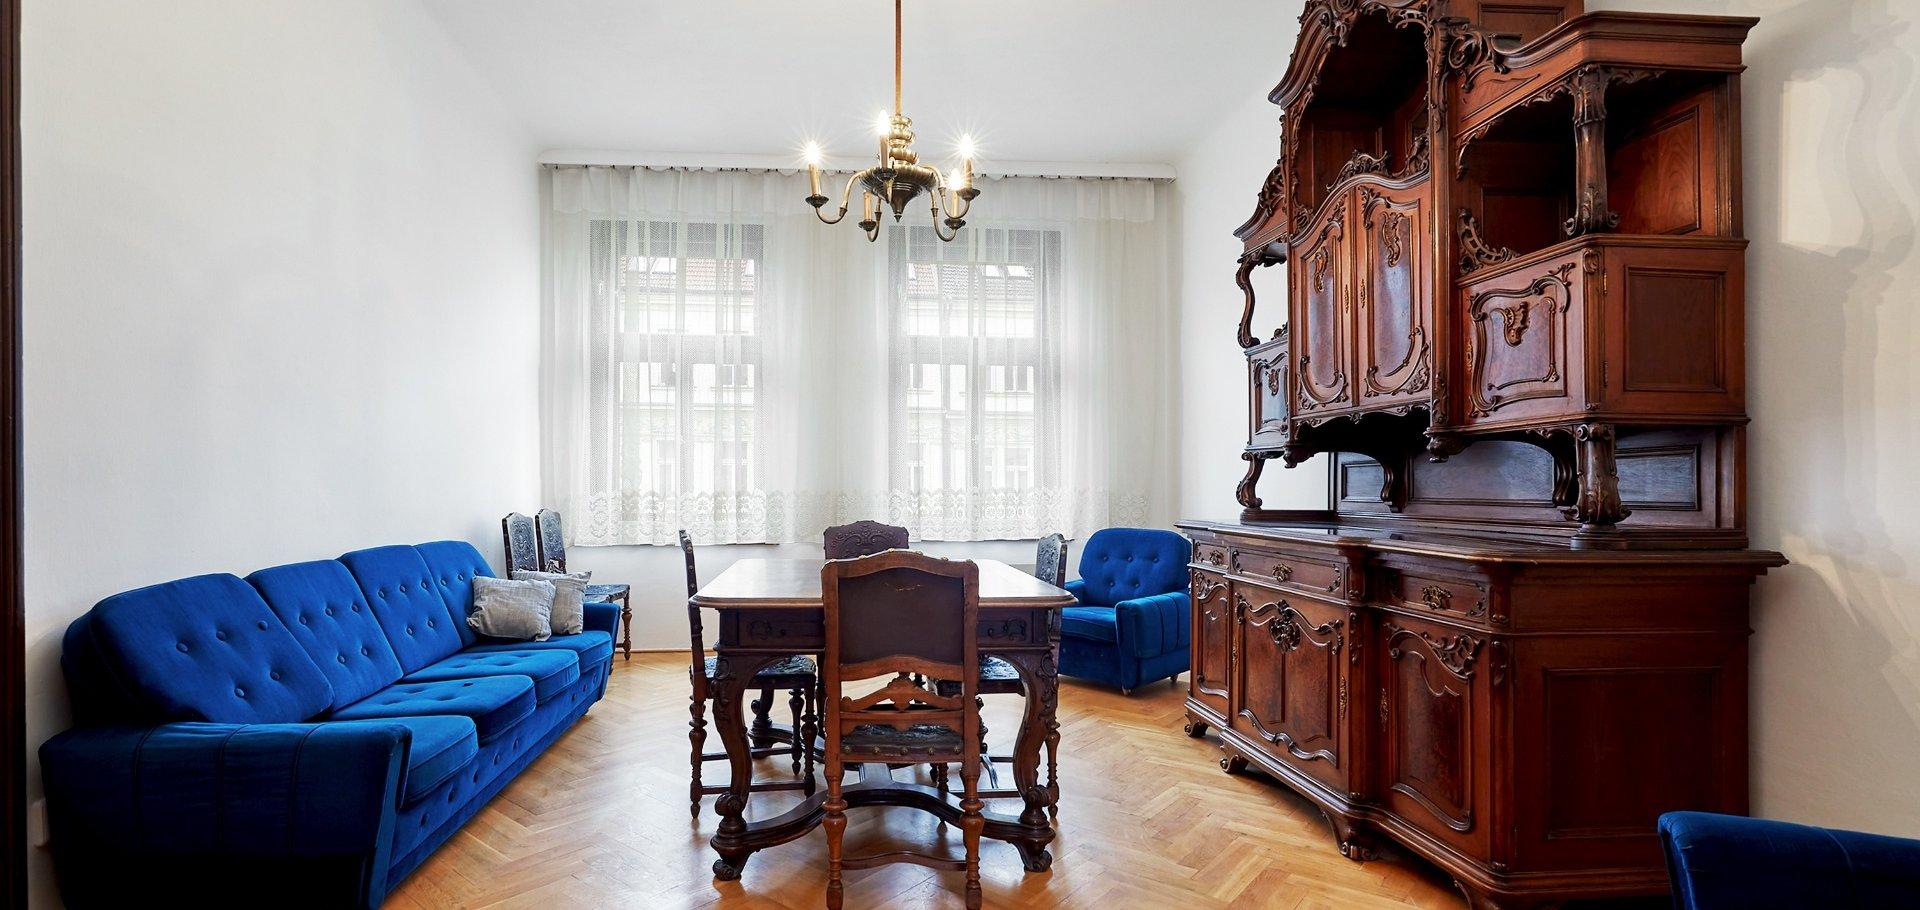 Pronájem bytu 2+1 s nádechem historie, 80m², Praha - Vinohrady